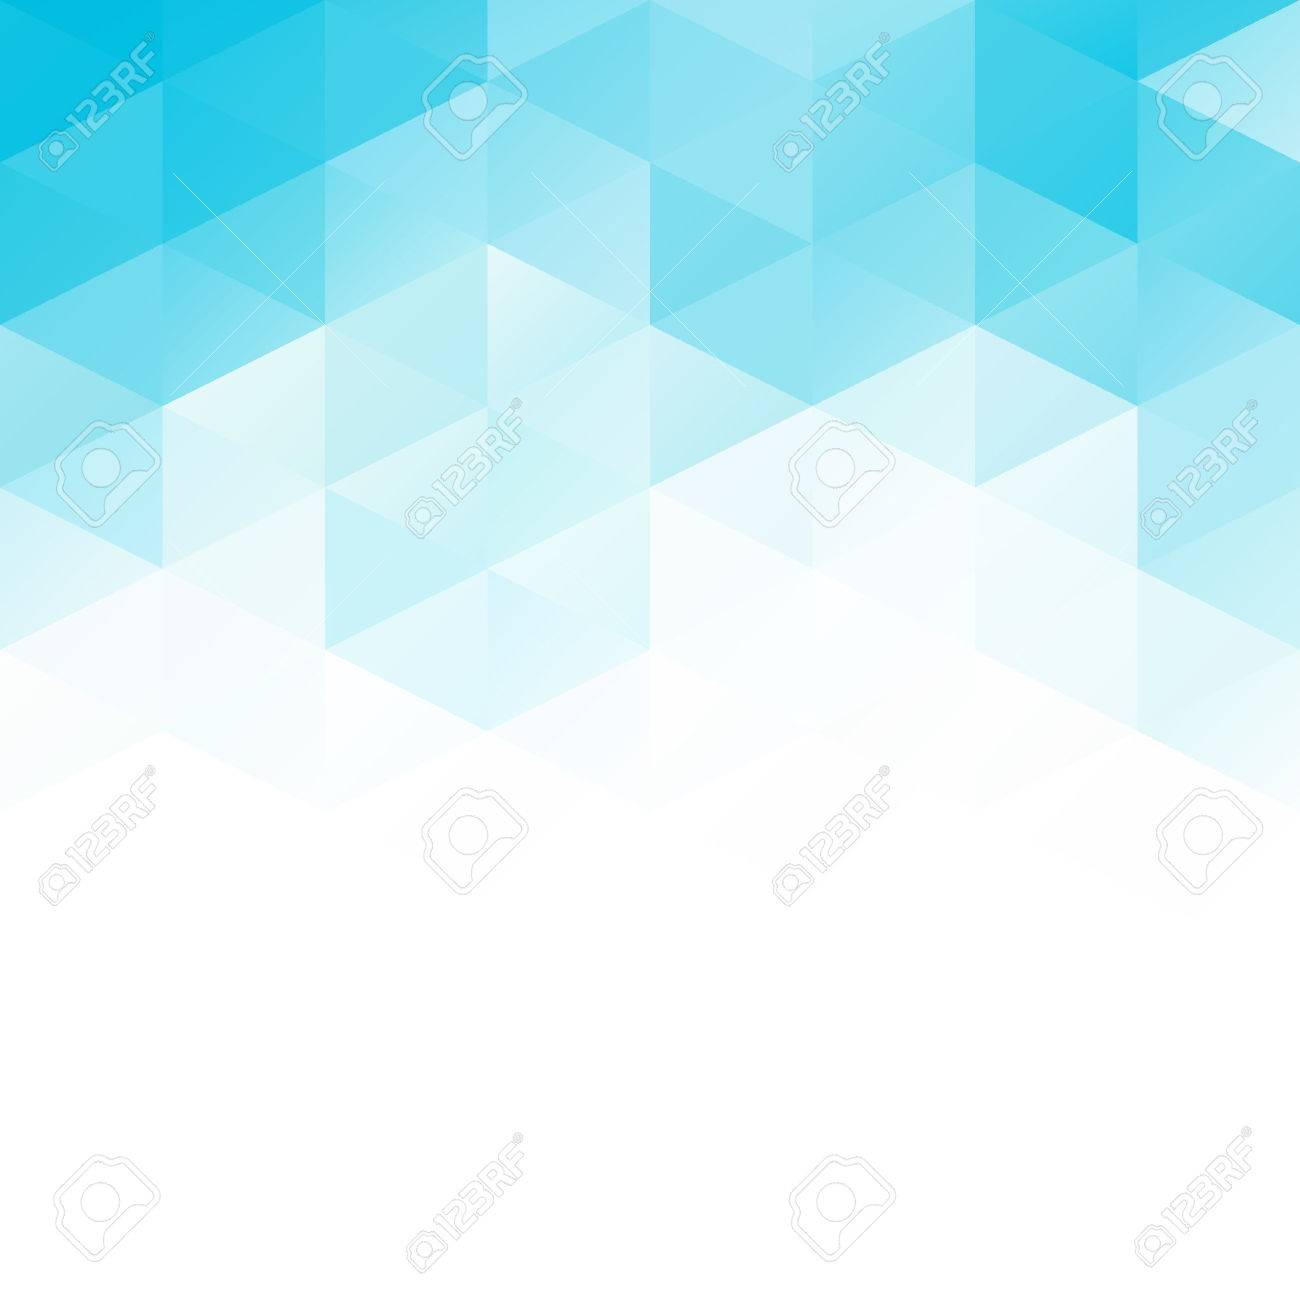 Blue Grid Mosaic Background, Creative Design Templates Royalty ...